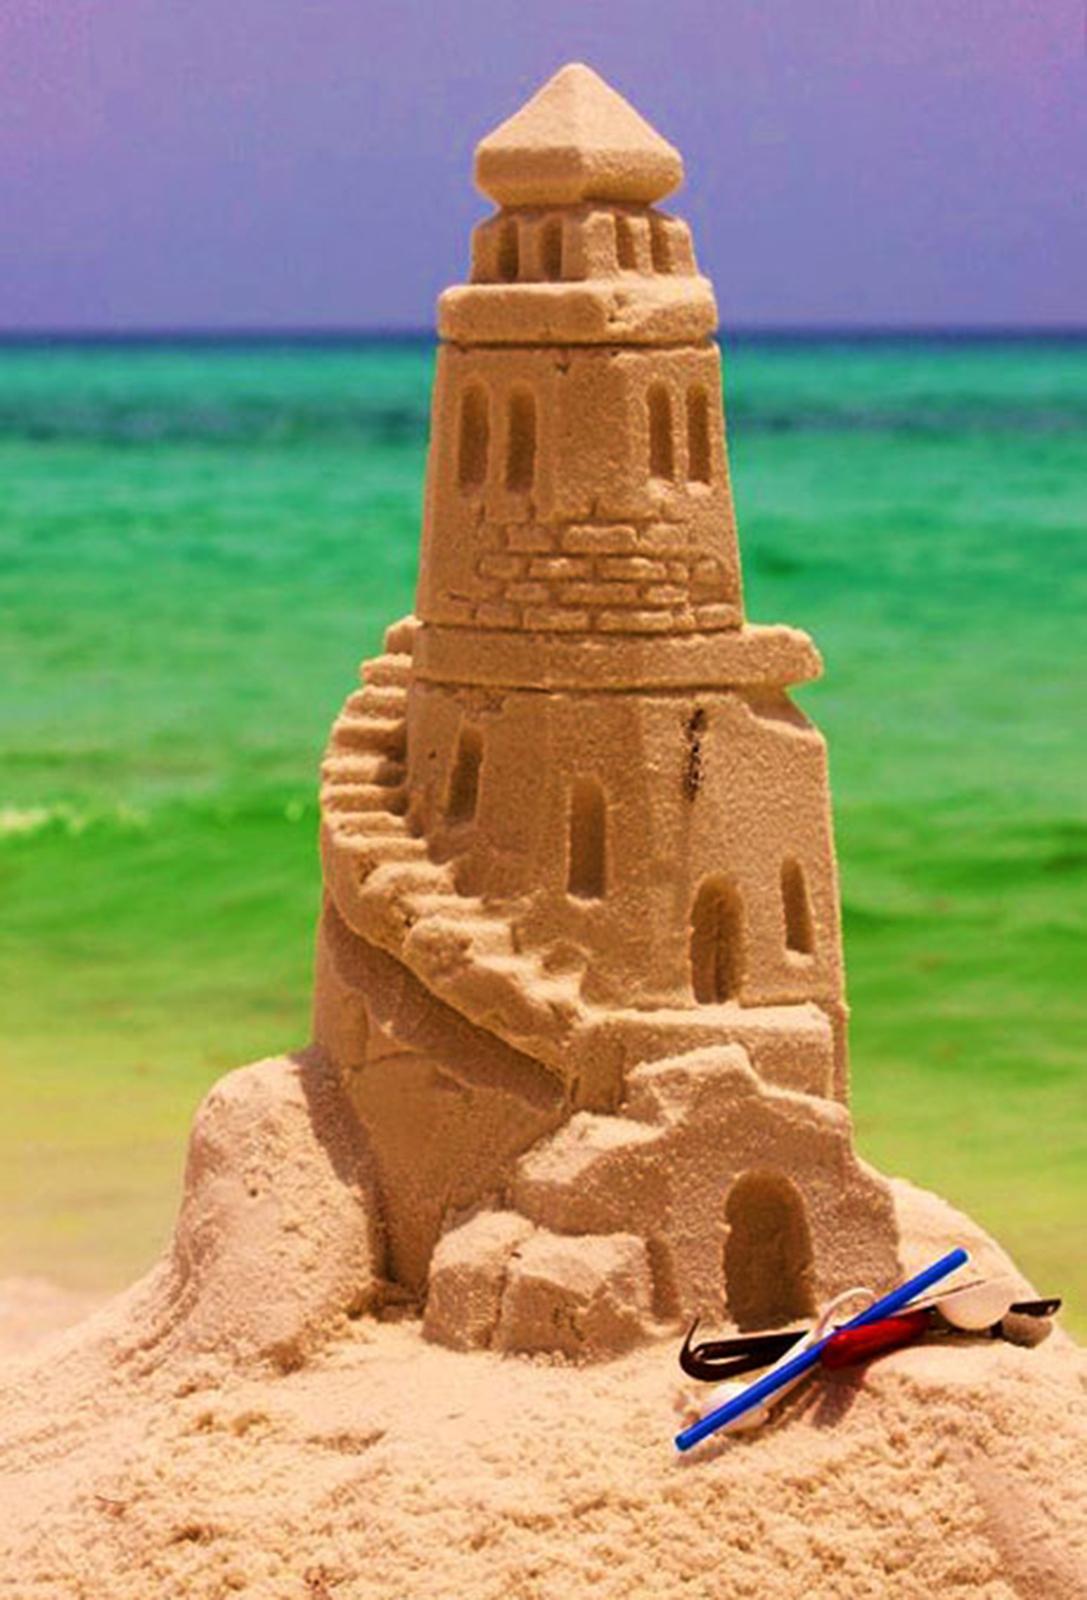 SandCastle Lessons on 30A - Santa Rosa Beach, FL - Kid ...